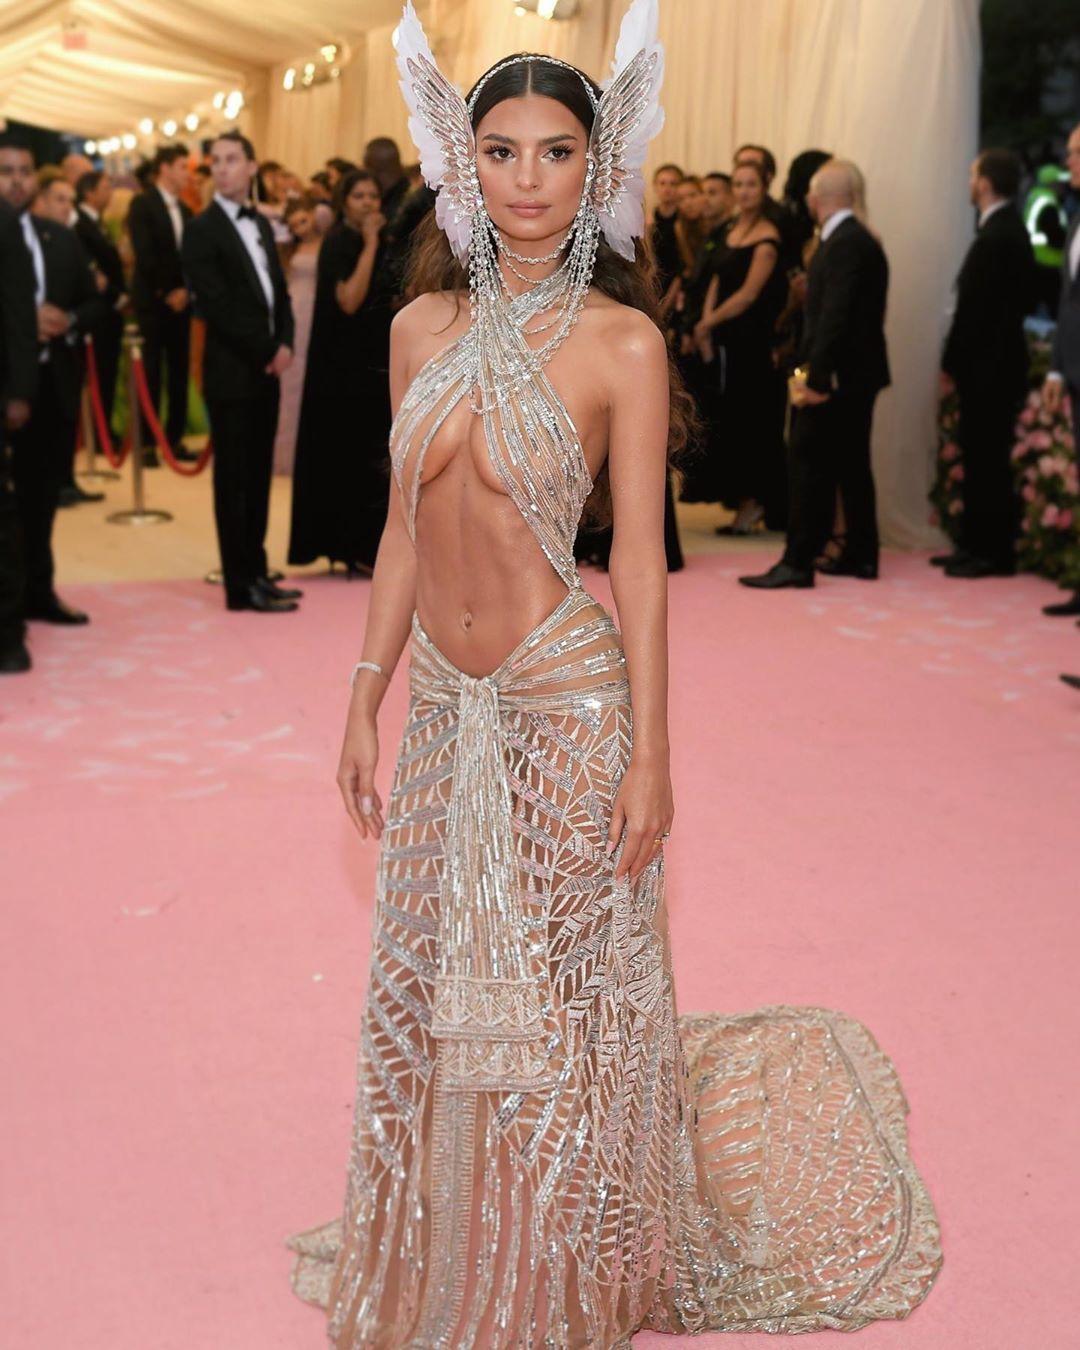 Emily Ratajkowski On Instagram Met 2019 Revealing Dresses Gala Dresses Met Gala Dresses